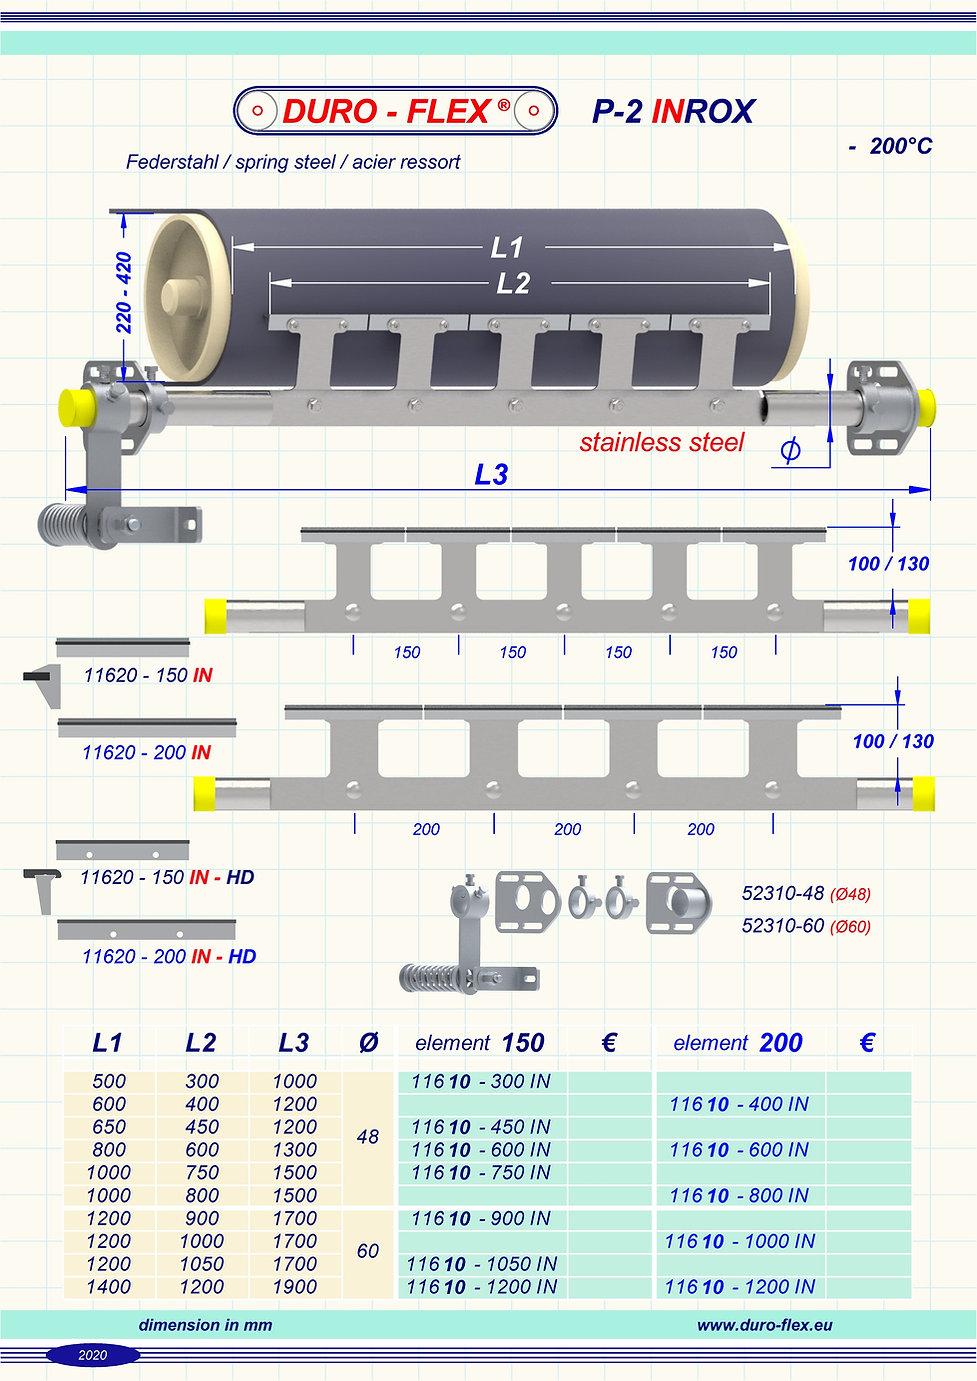 Typenliste P-2 INROX.jpg